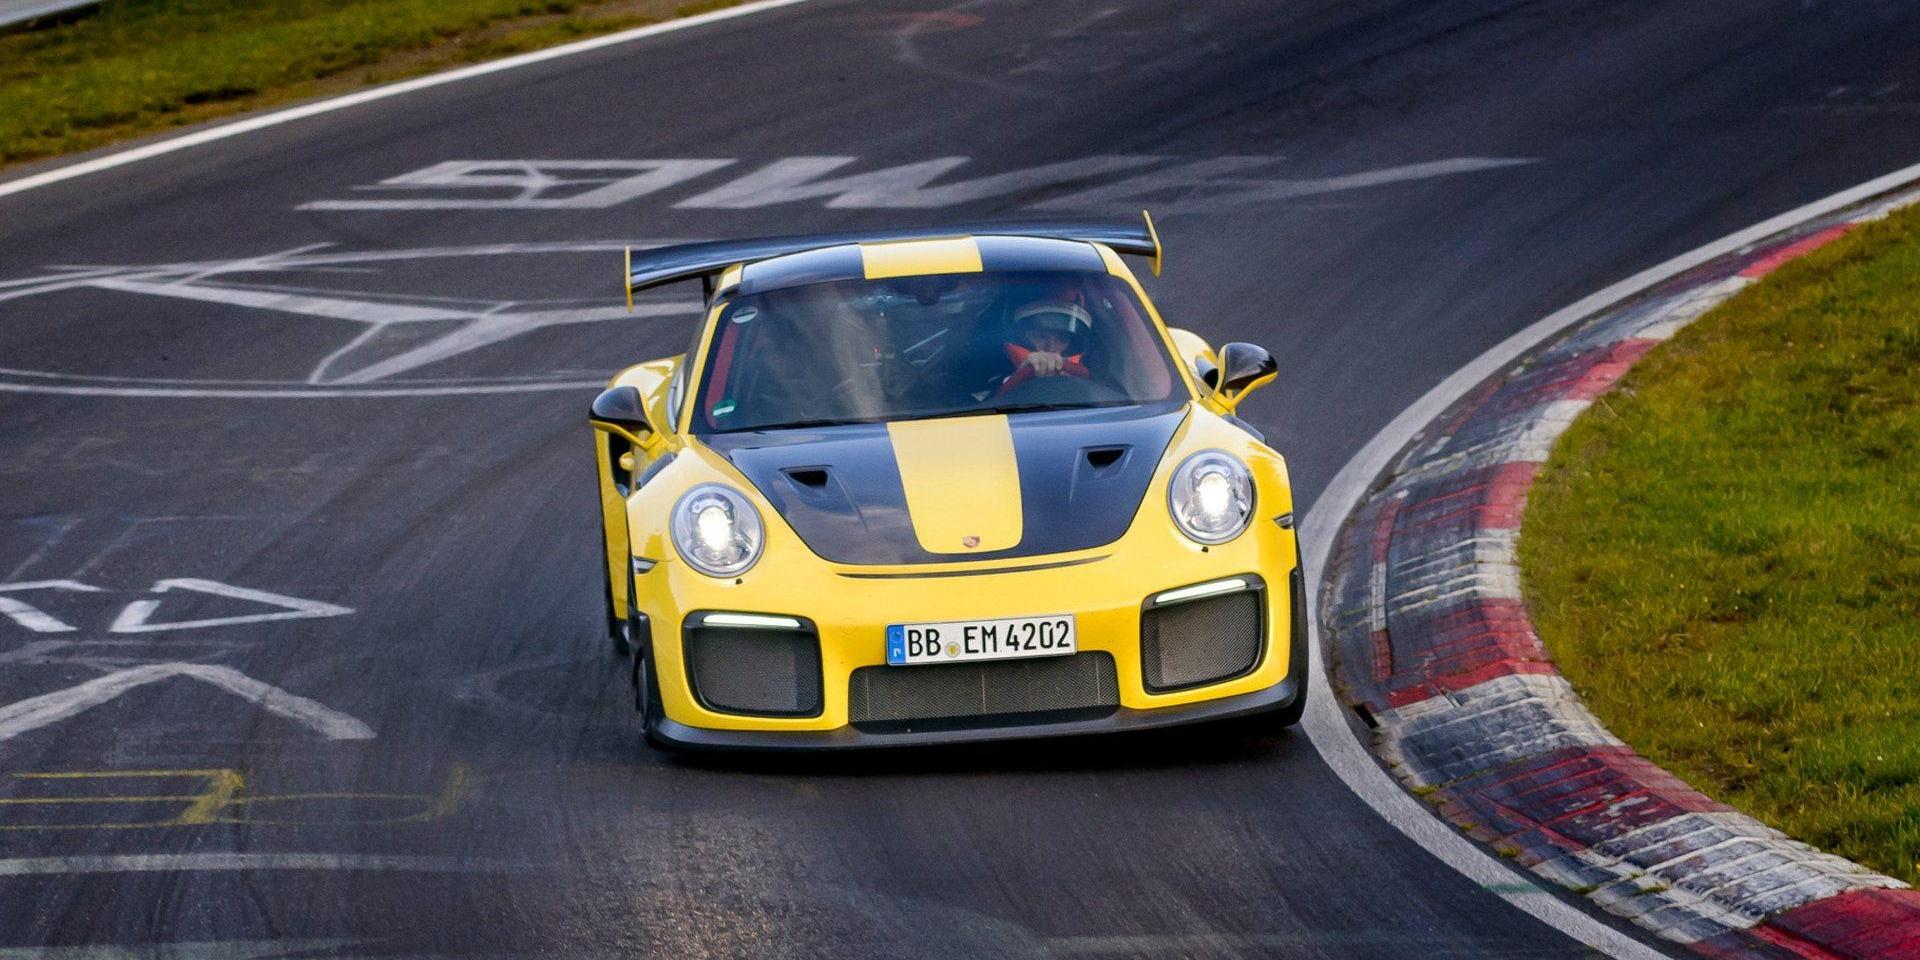 Nurburgring最速再掀波瀾,Porsche 911 GT2 RS破紀錄來襲